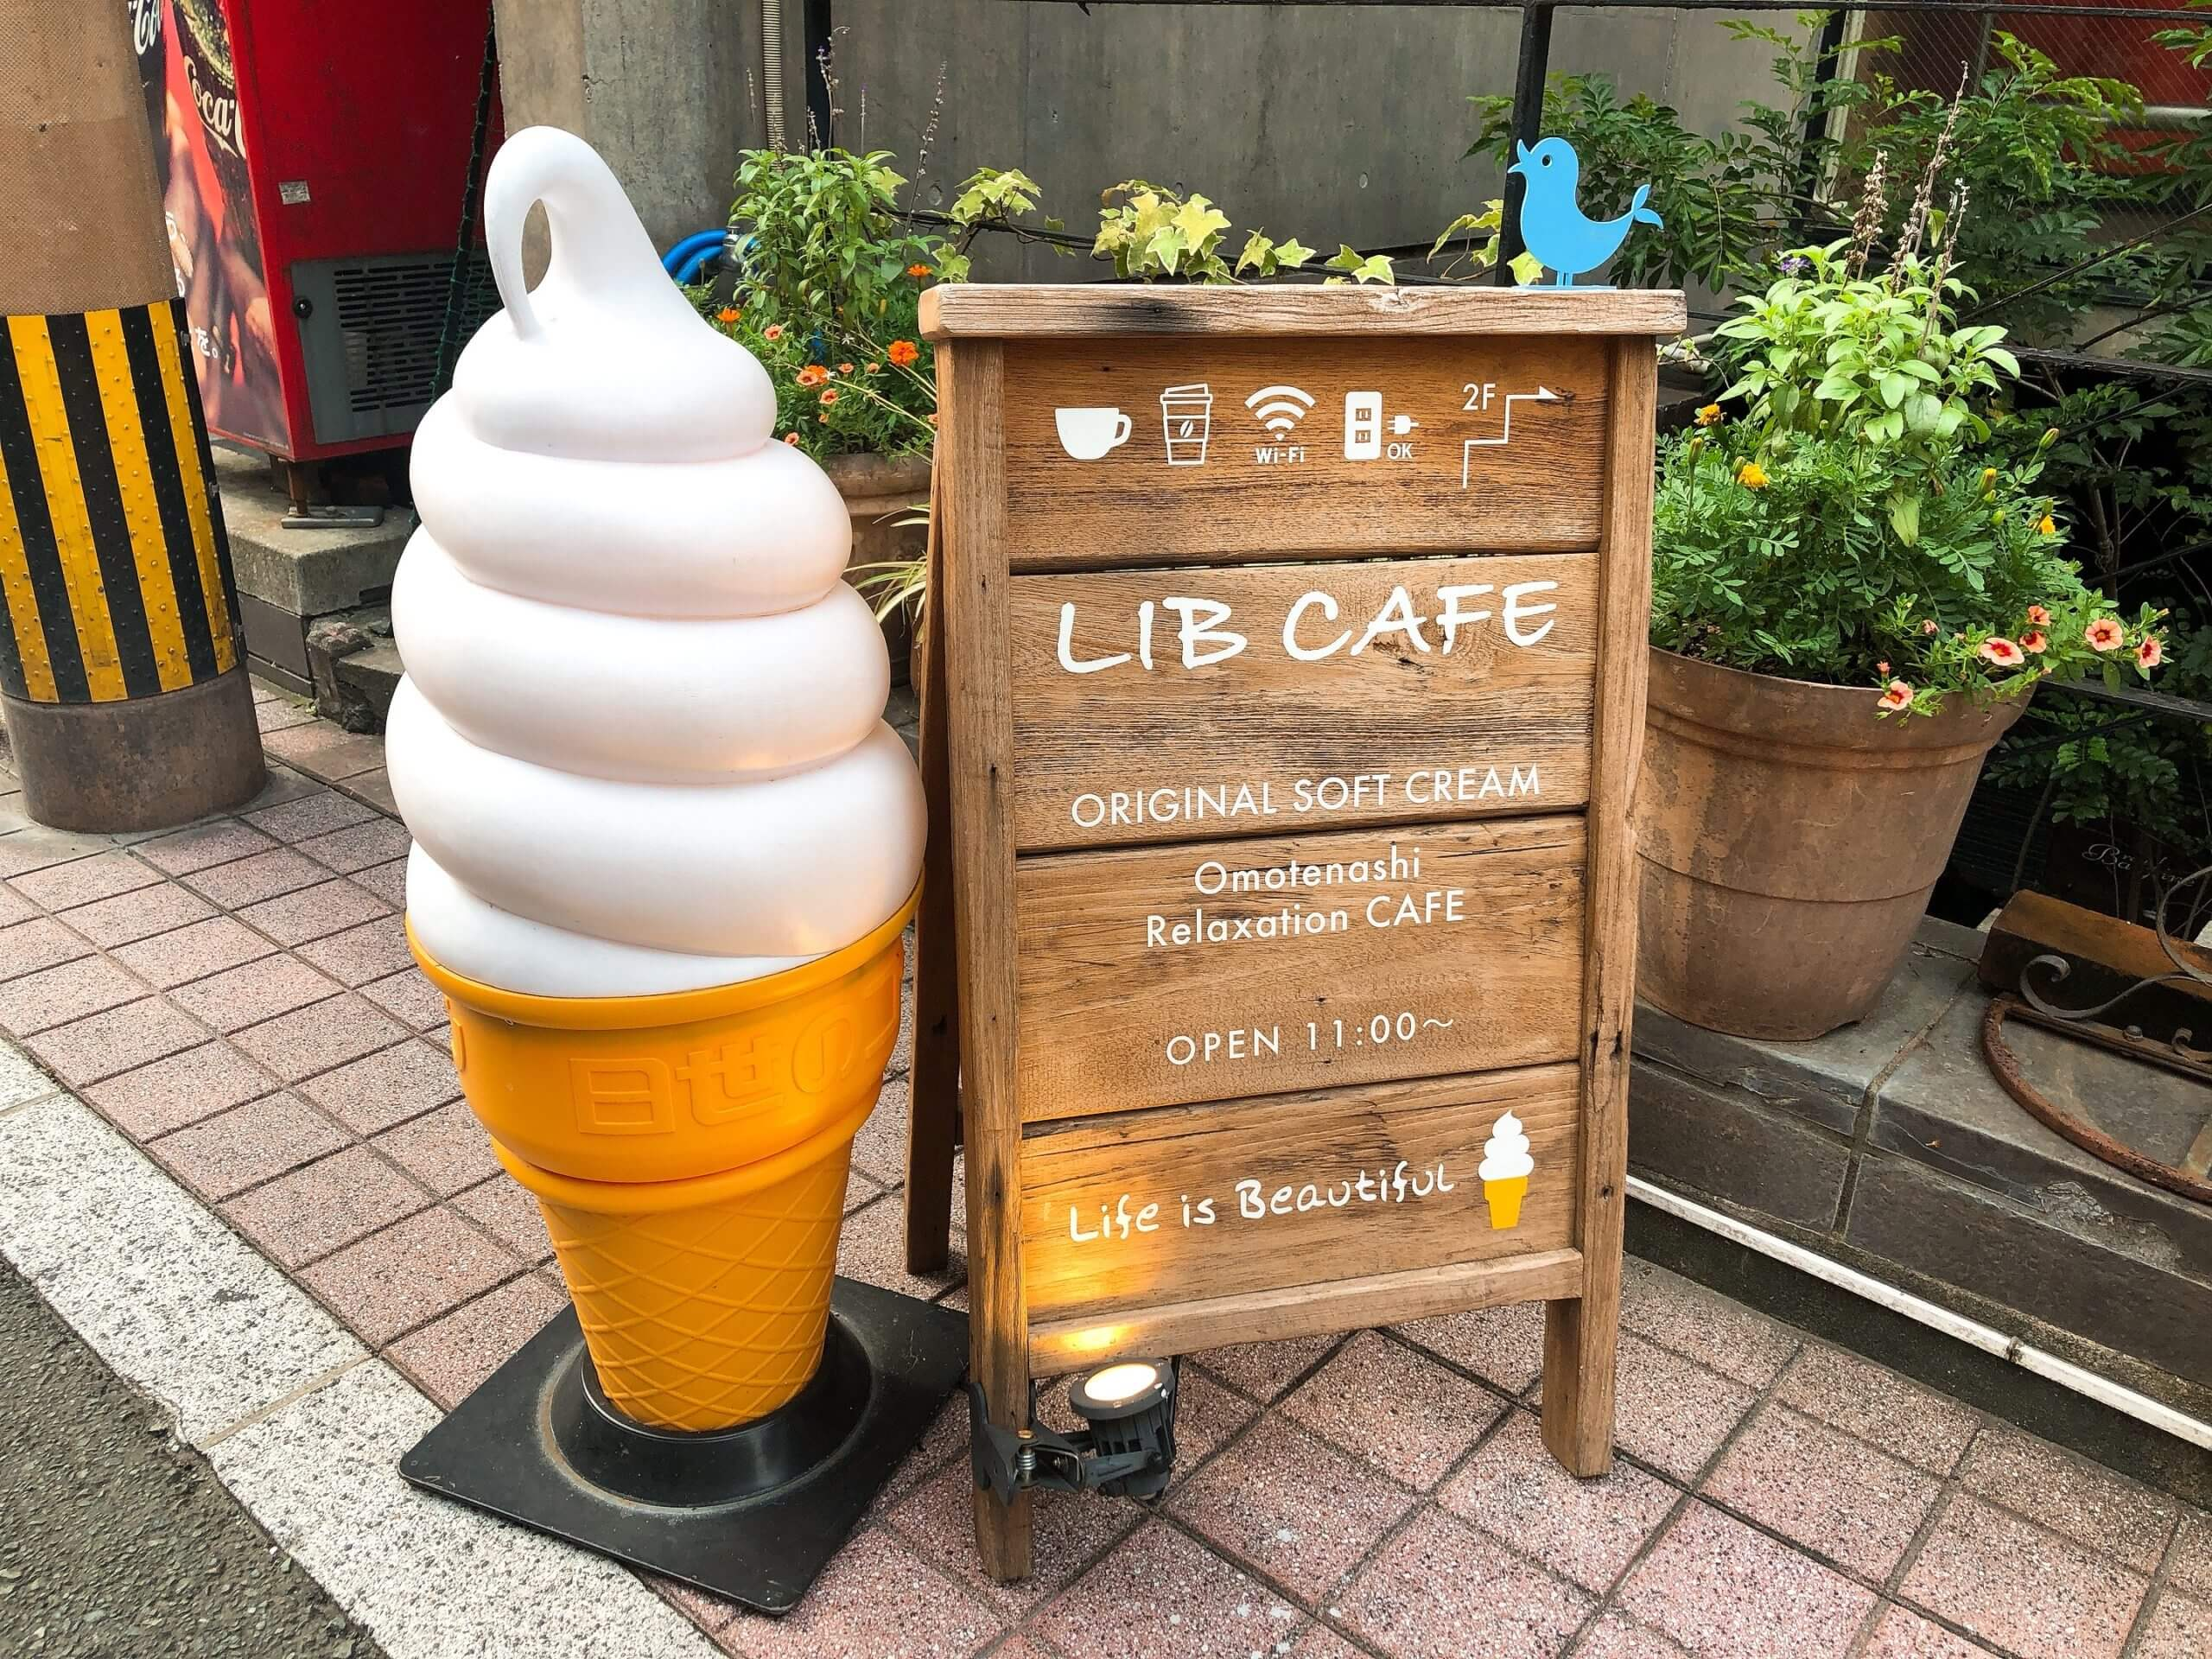 【LIBCAFEリブカフェ】さっぱりして食べやすい!ソフトクリーム専門店!!【熊本市中央区新市街】